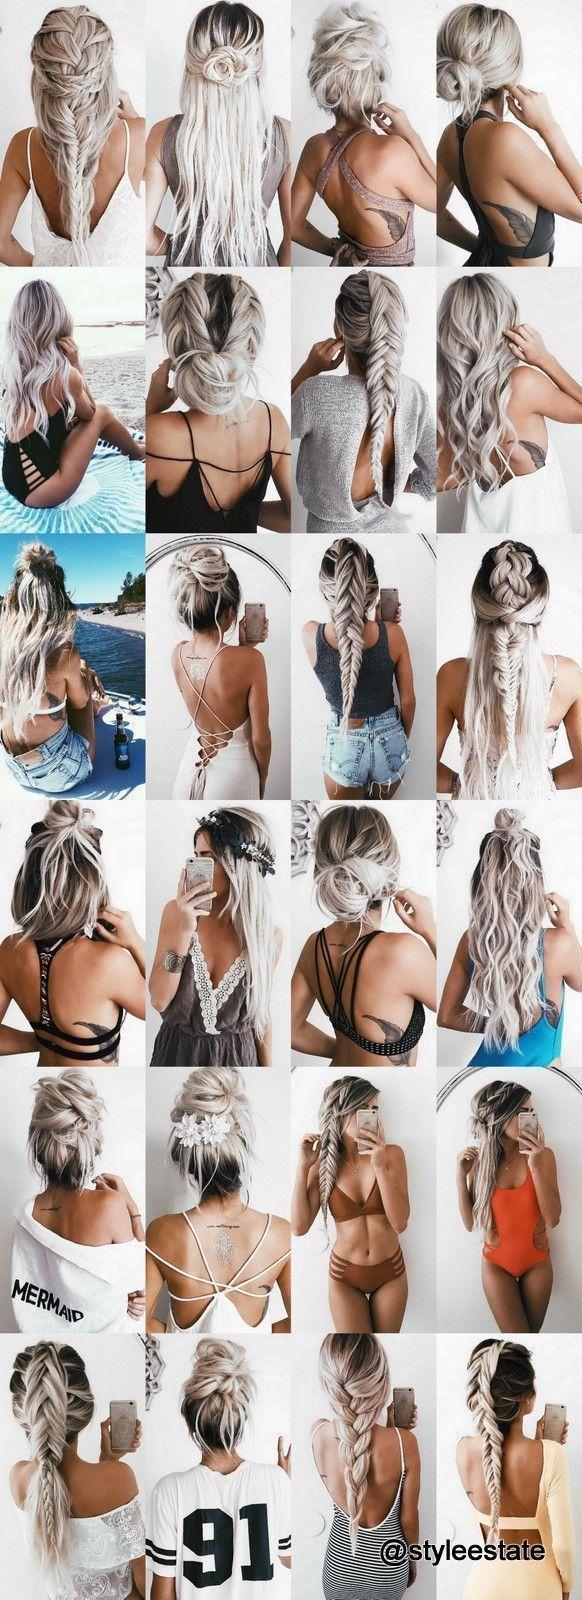 Die Top 24 Frisuren 2016 des blonden IG-Models Emi…